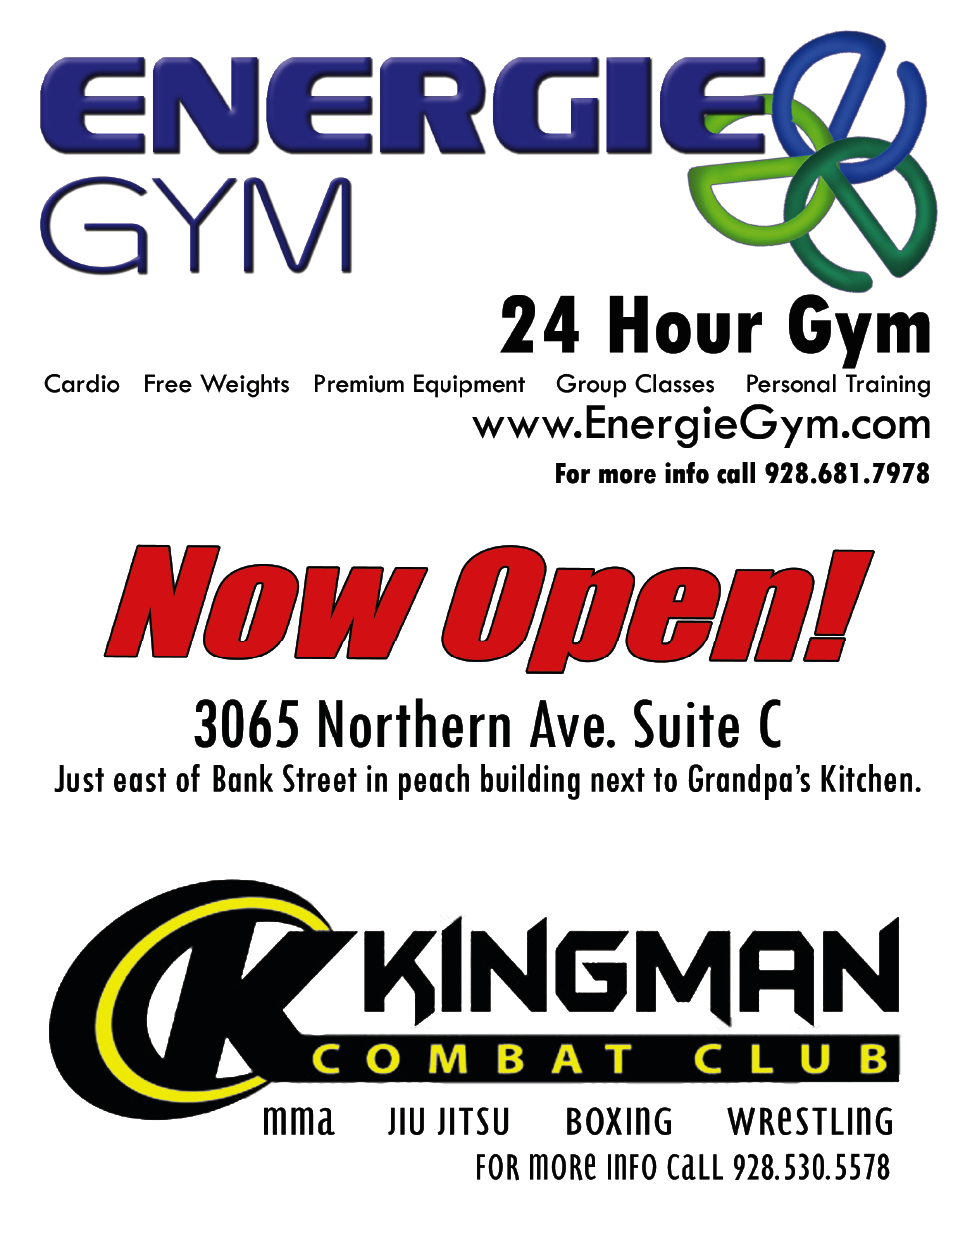 Energie Gym & Kingman Combat Club | thekingmanrealestateguy